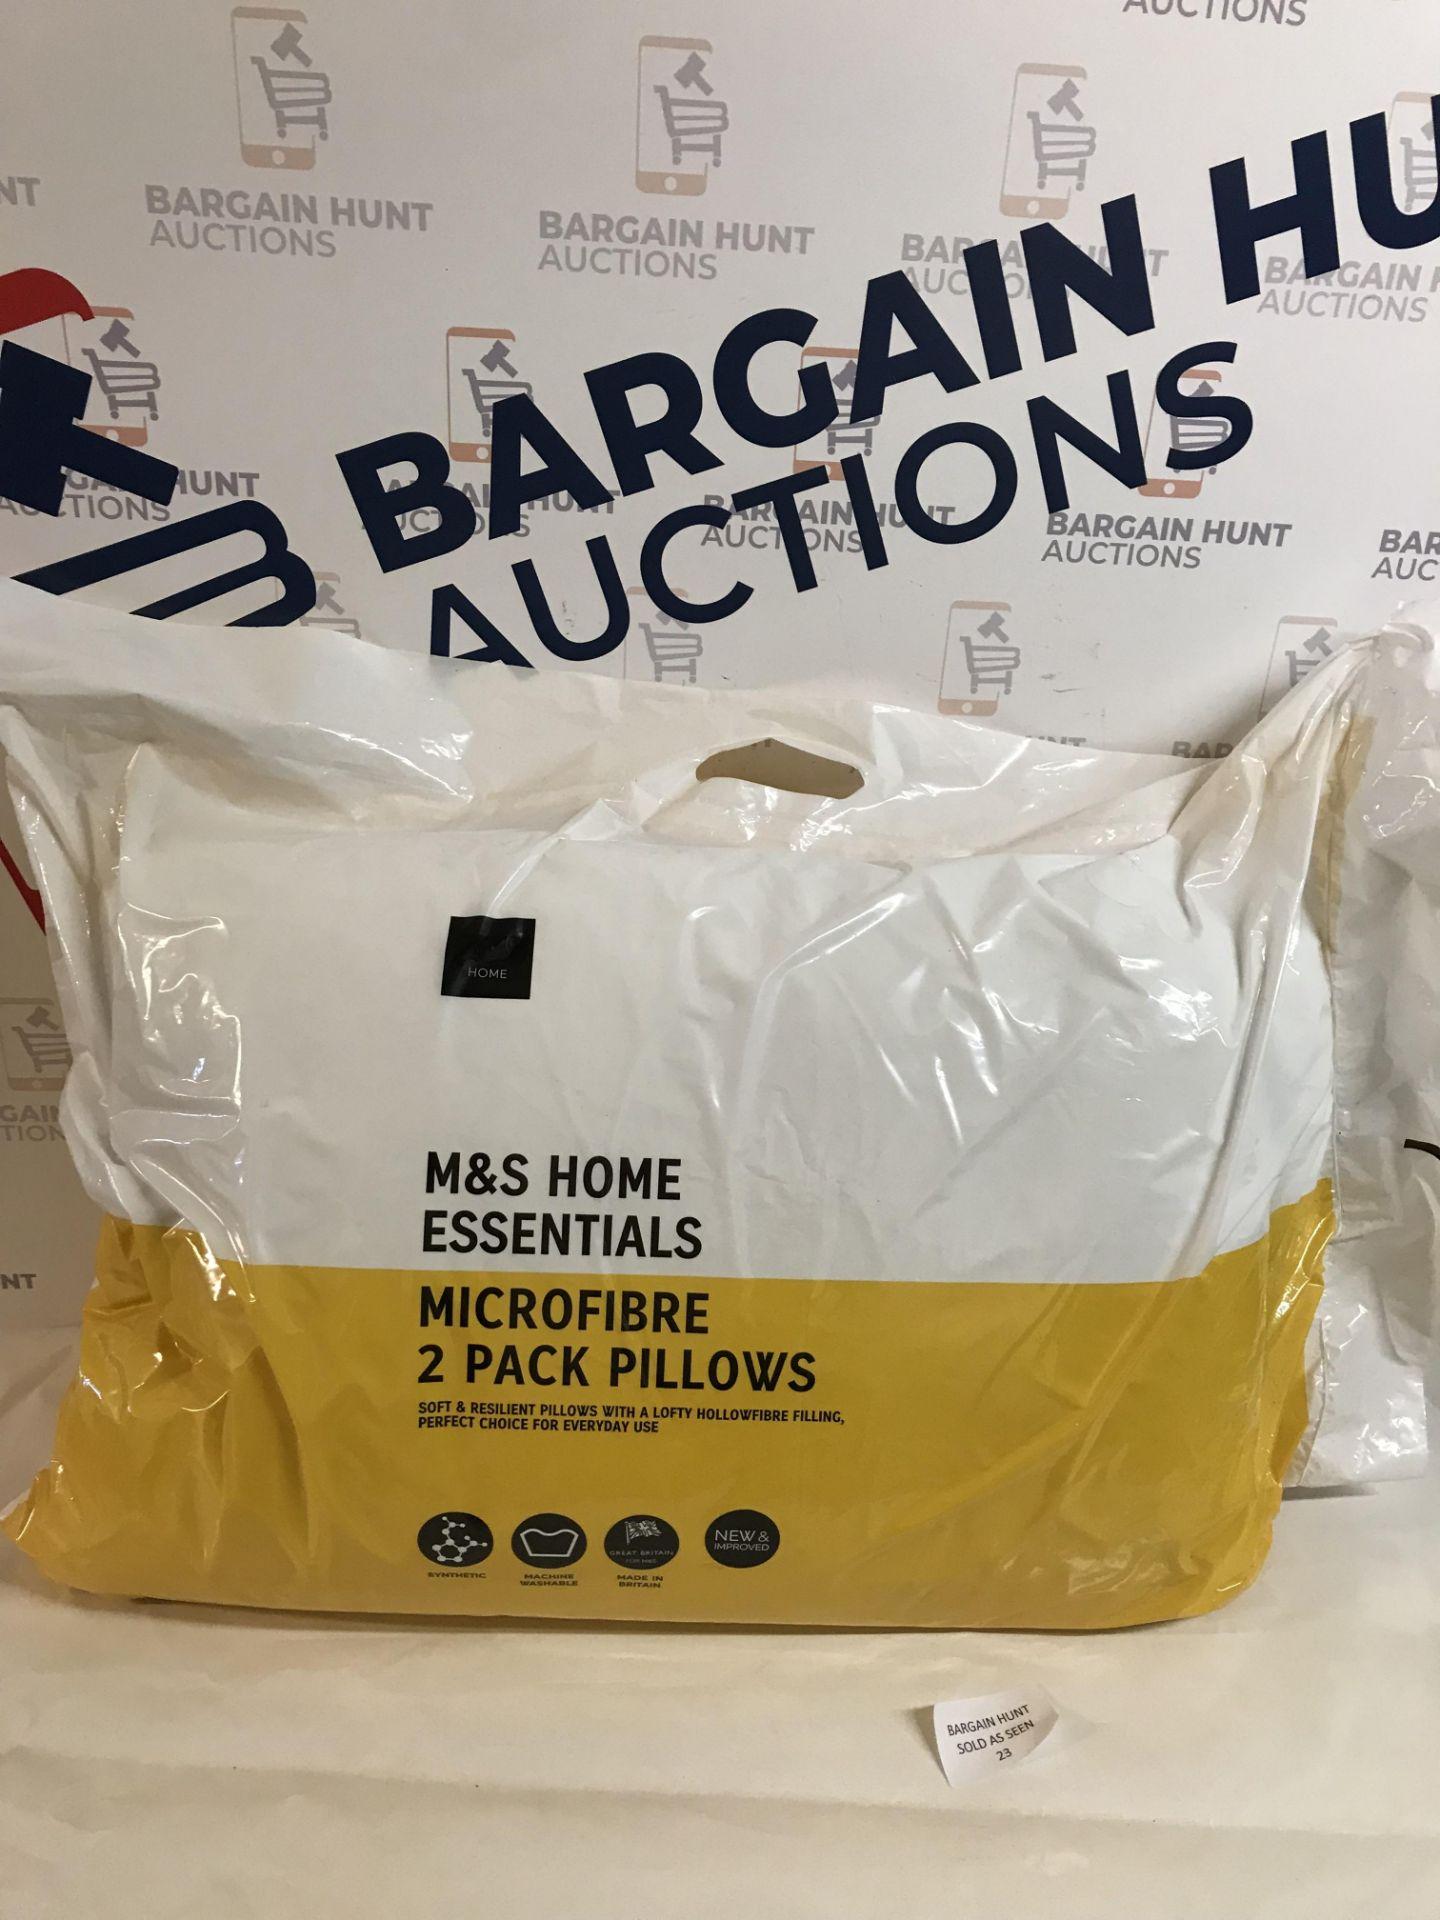 Lot 23 - Microfibre 2 Pack Pillows